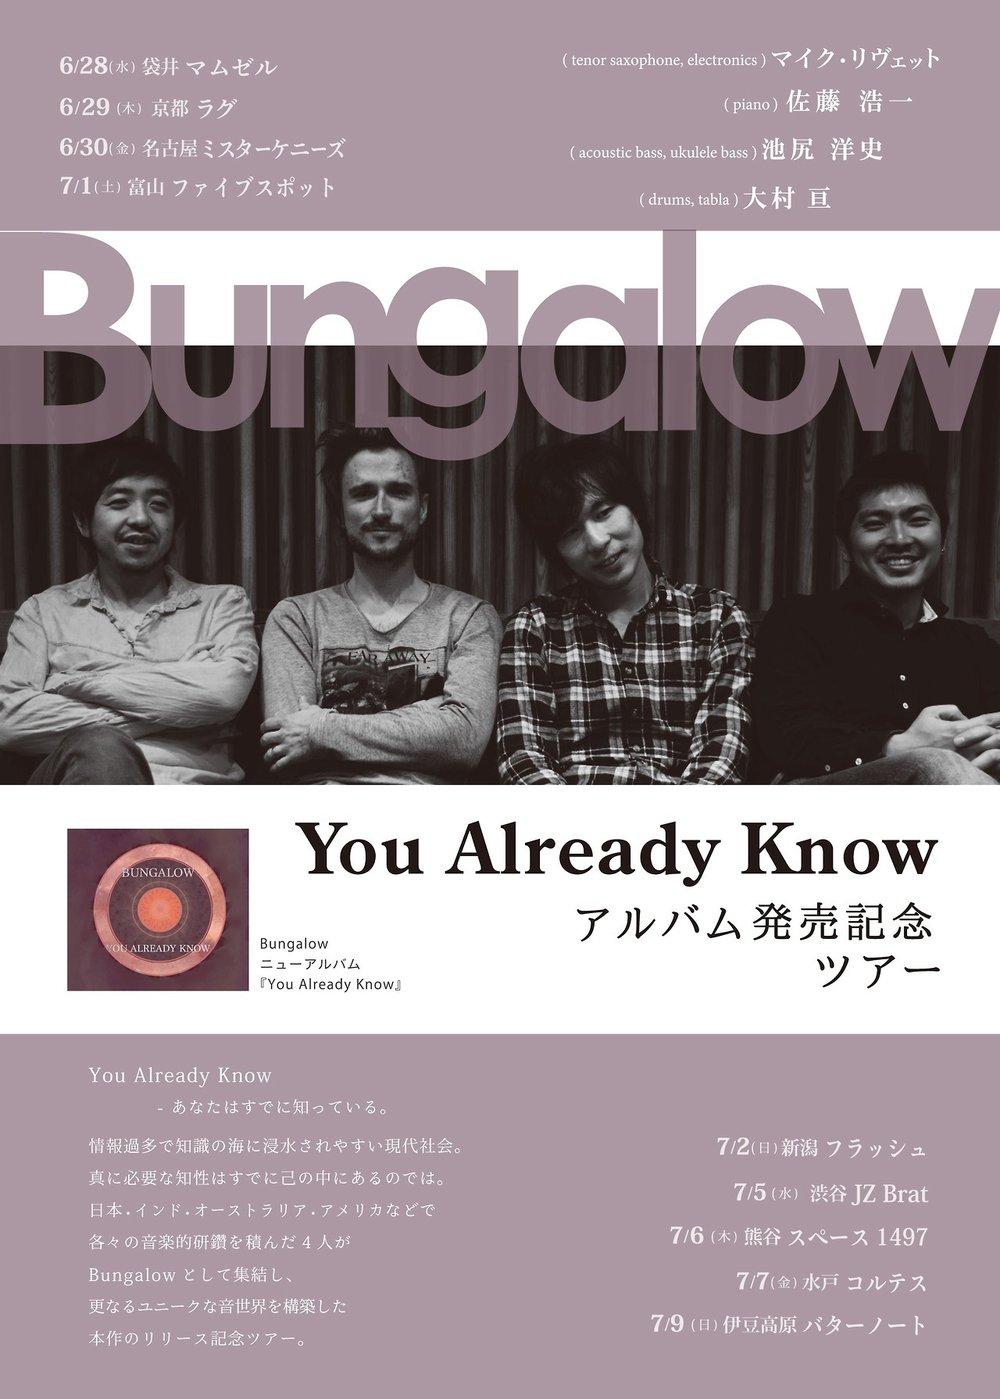 bungalow image.jpg